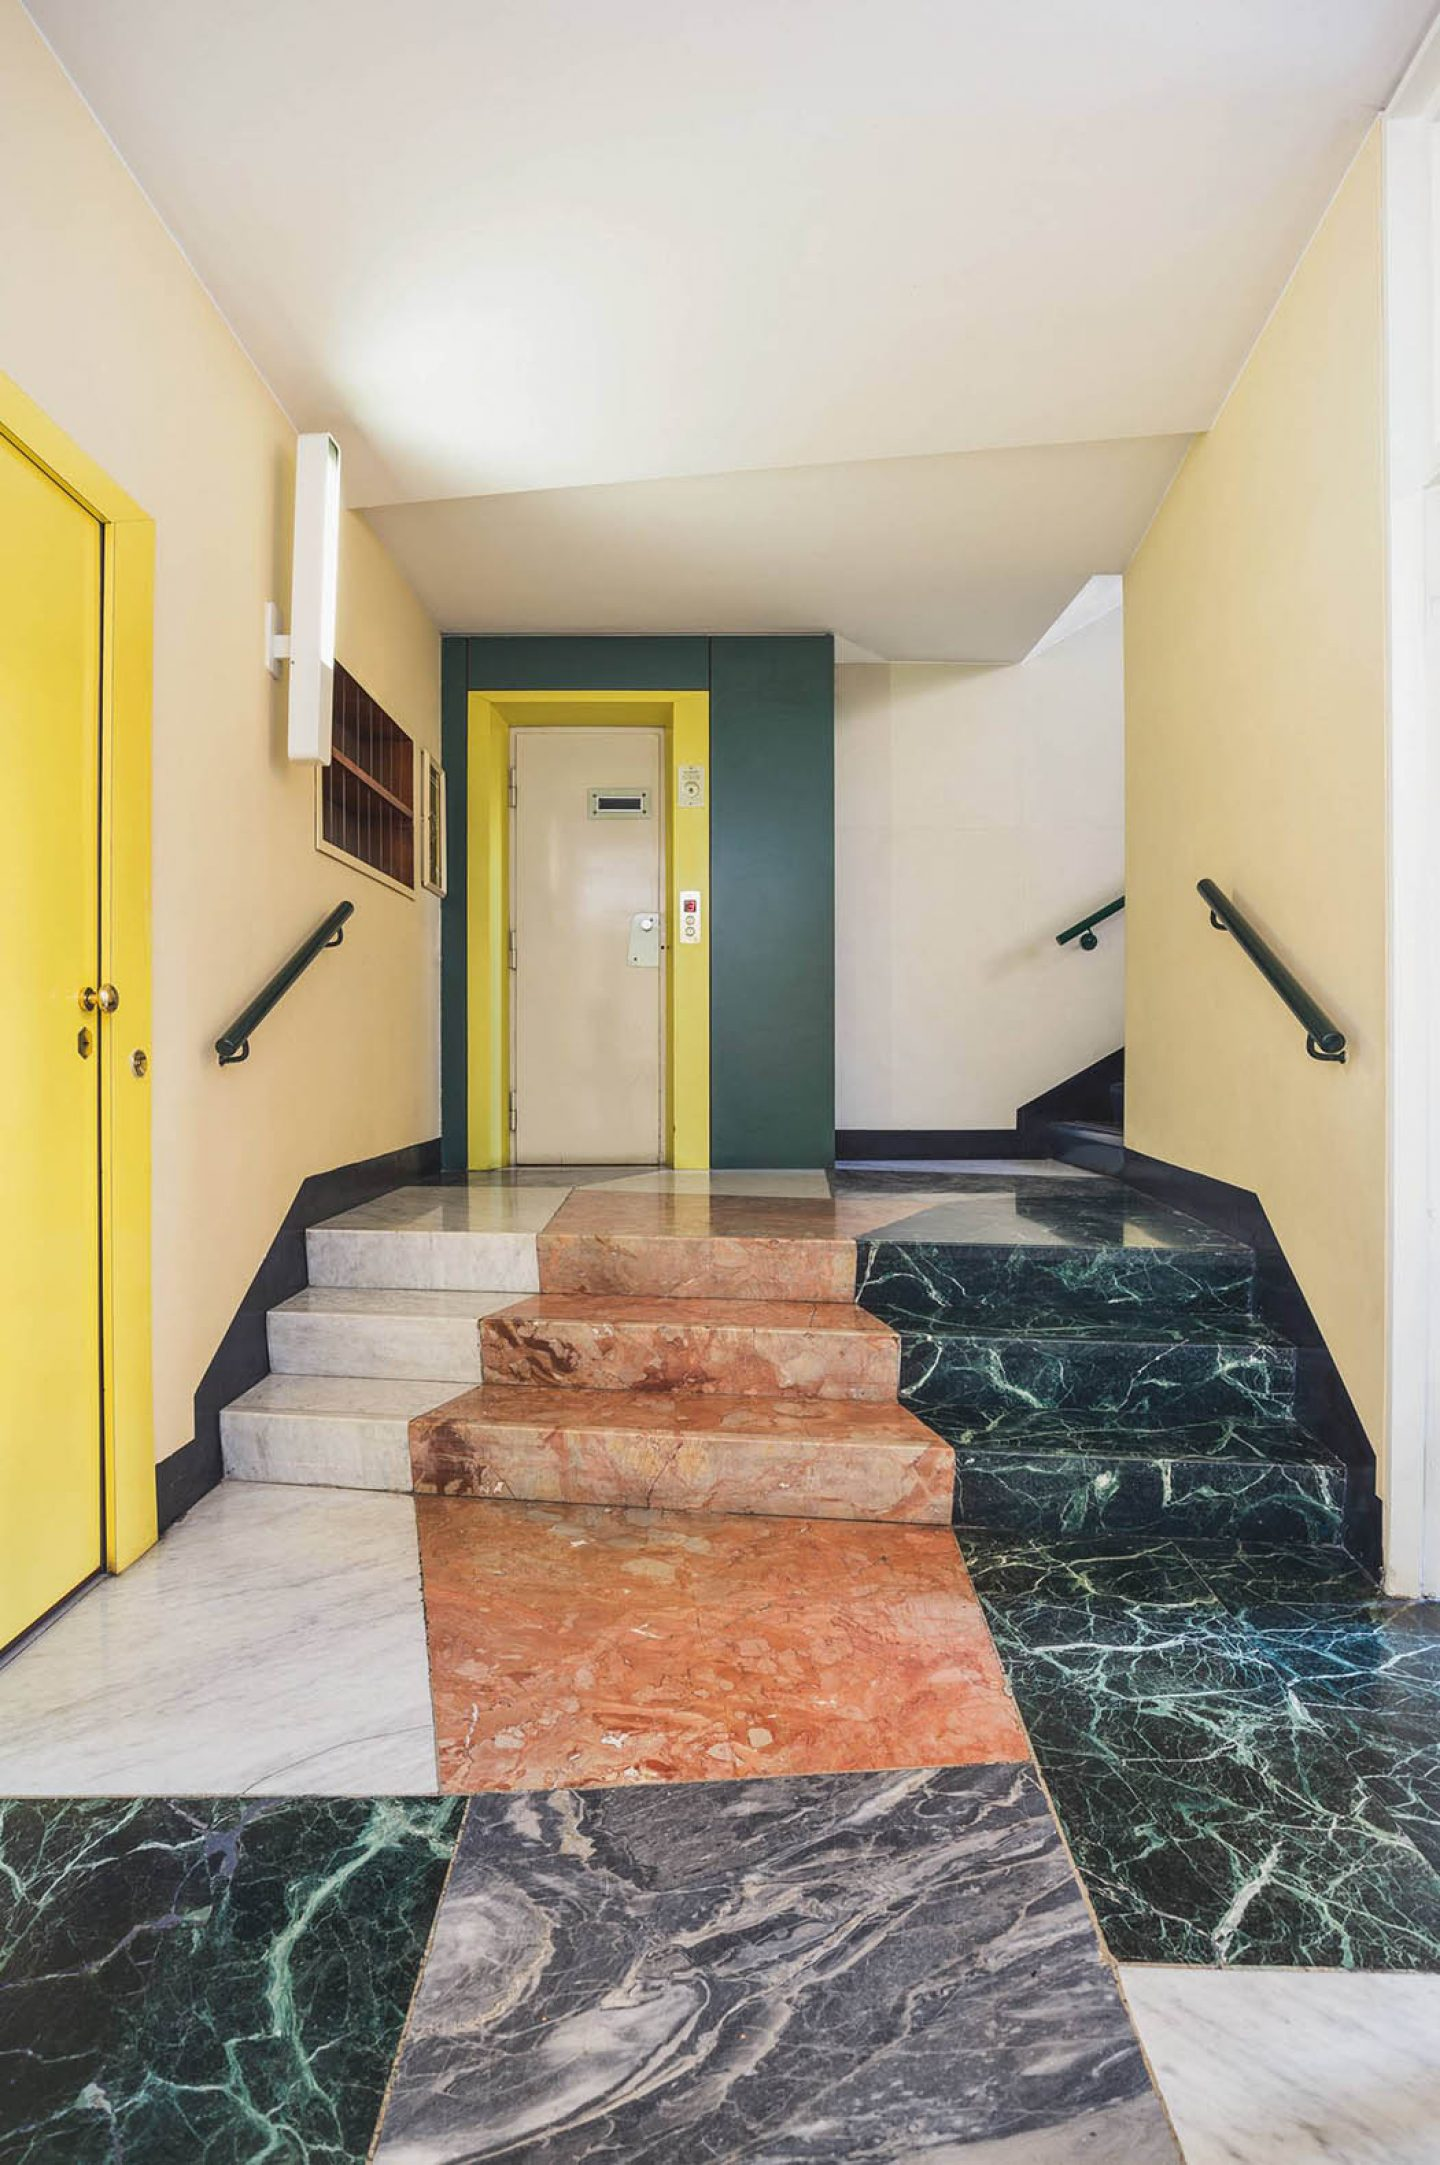 iGNANT_Architecture_Karl_Kolbitz_Taschen_Entryways_of_Milan_Ingressi_di_Milano_1